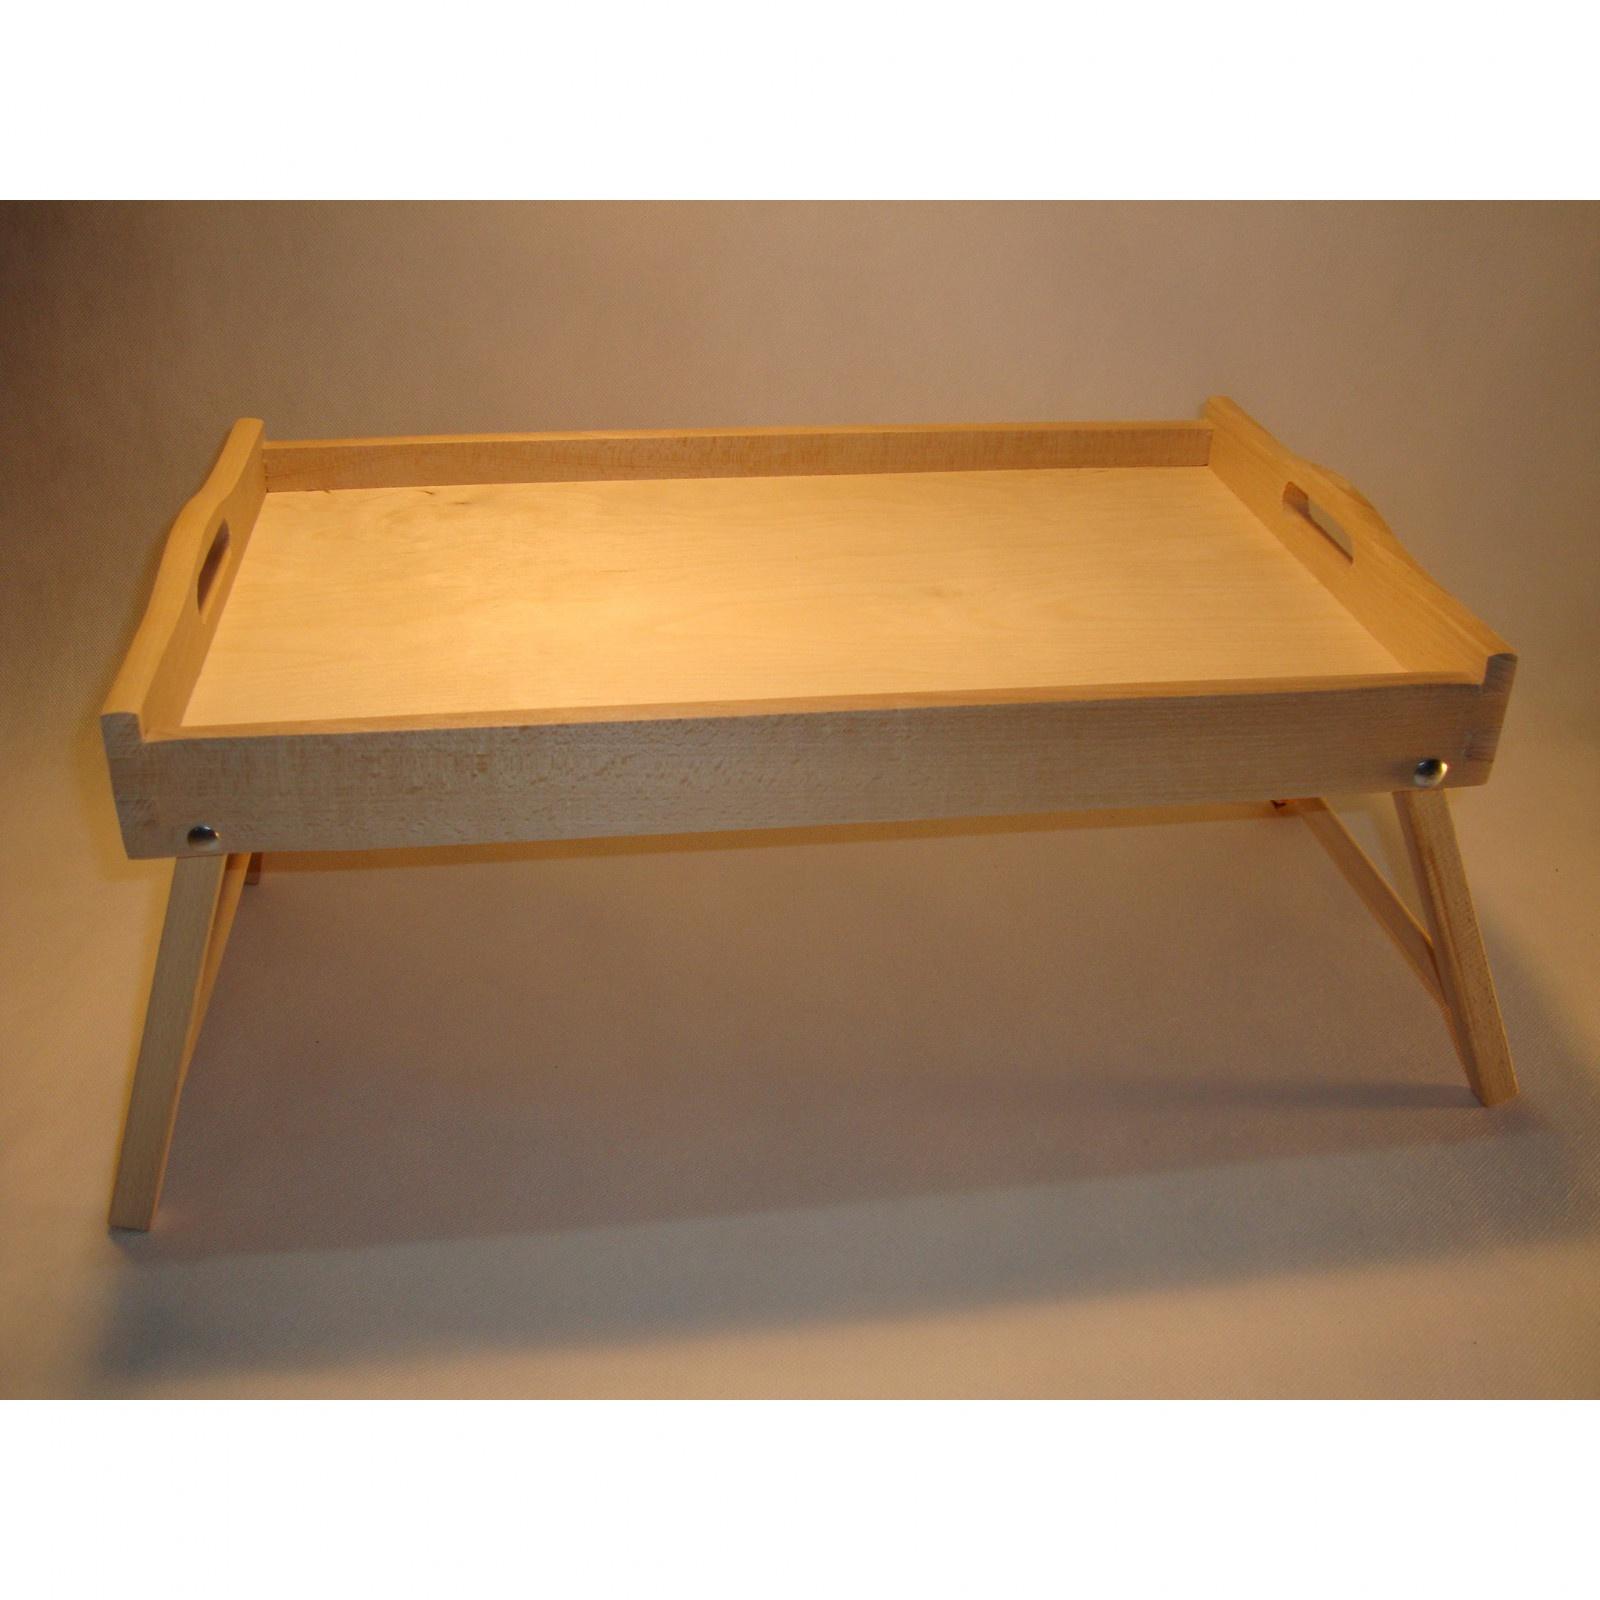 Raňajkový stôl do postele megamix.sk